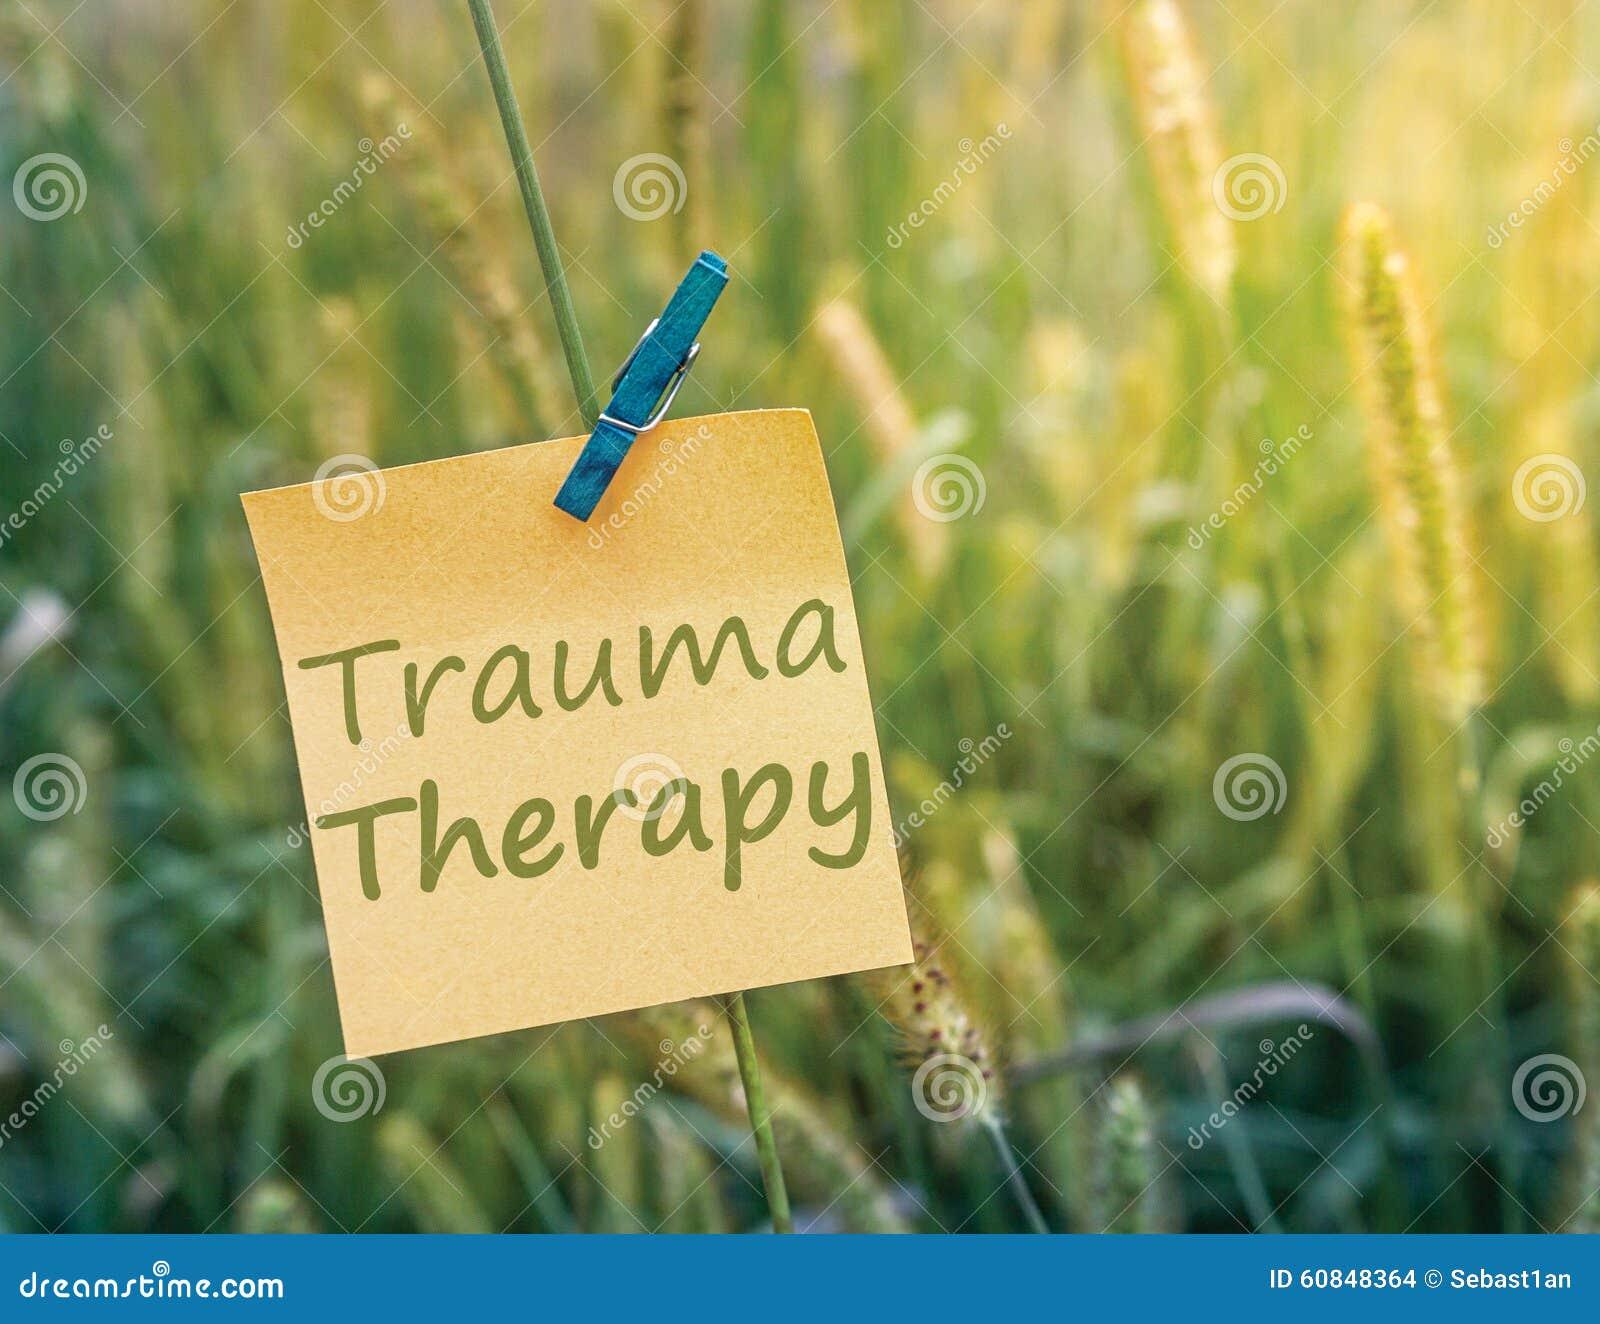 Traumaterapi